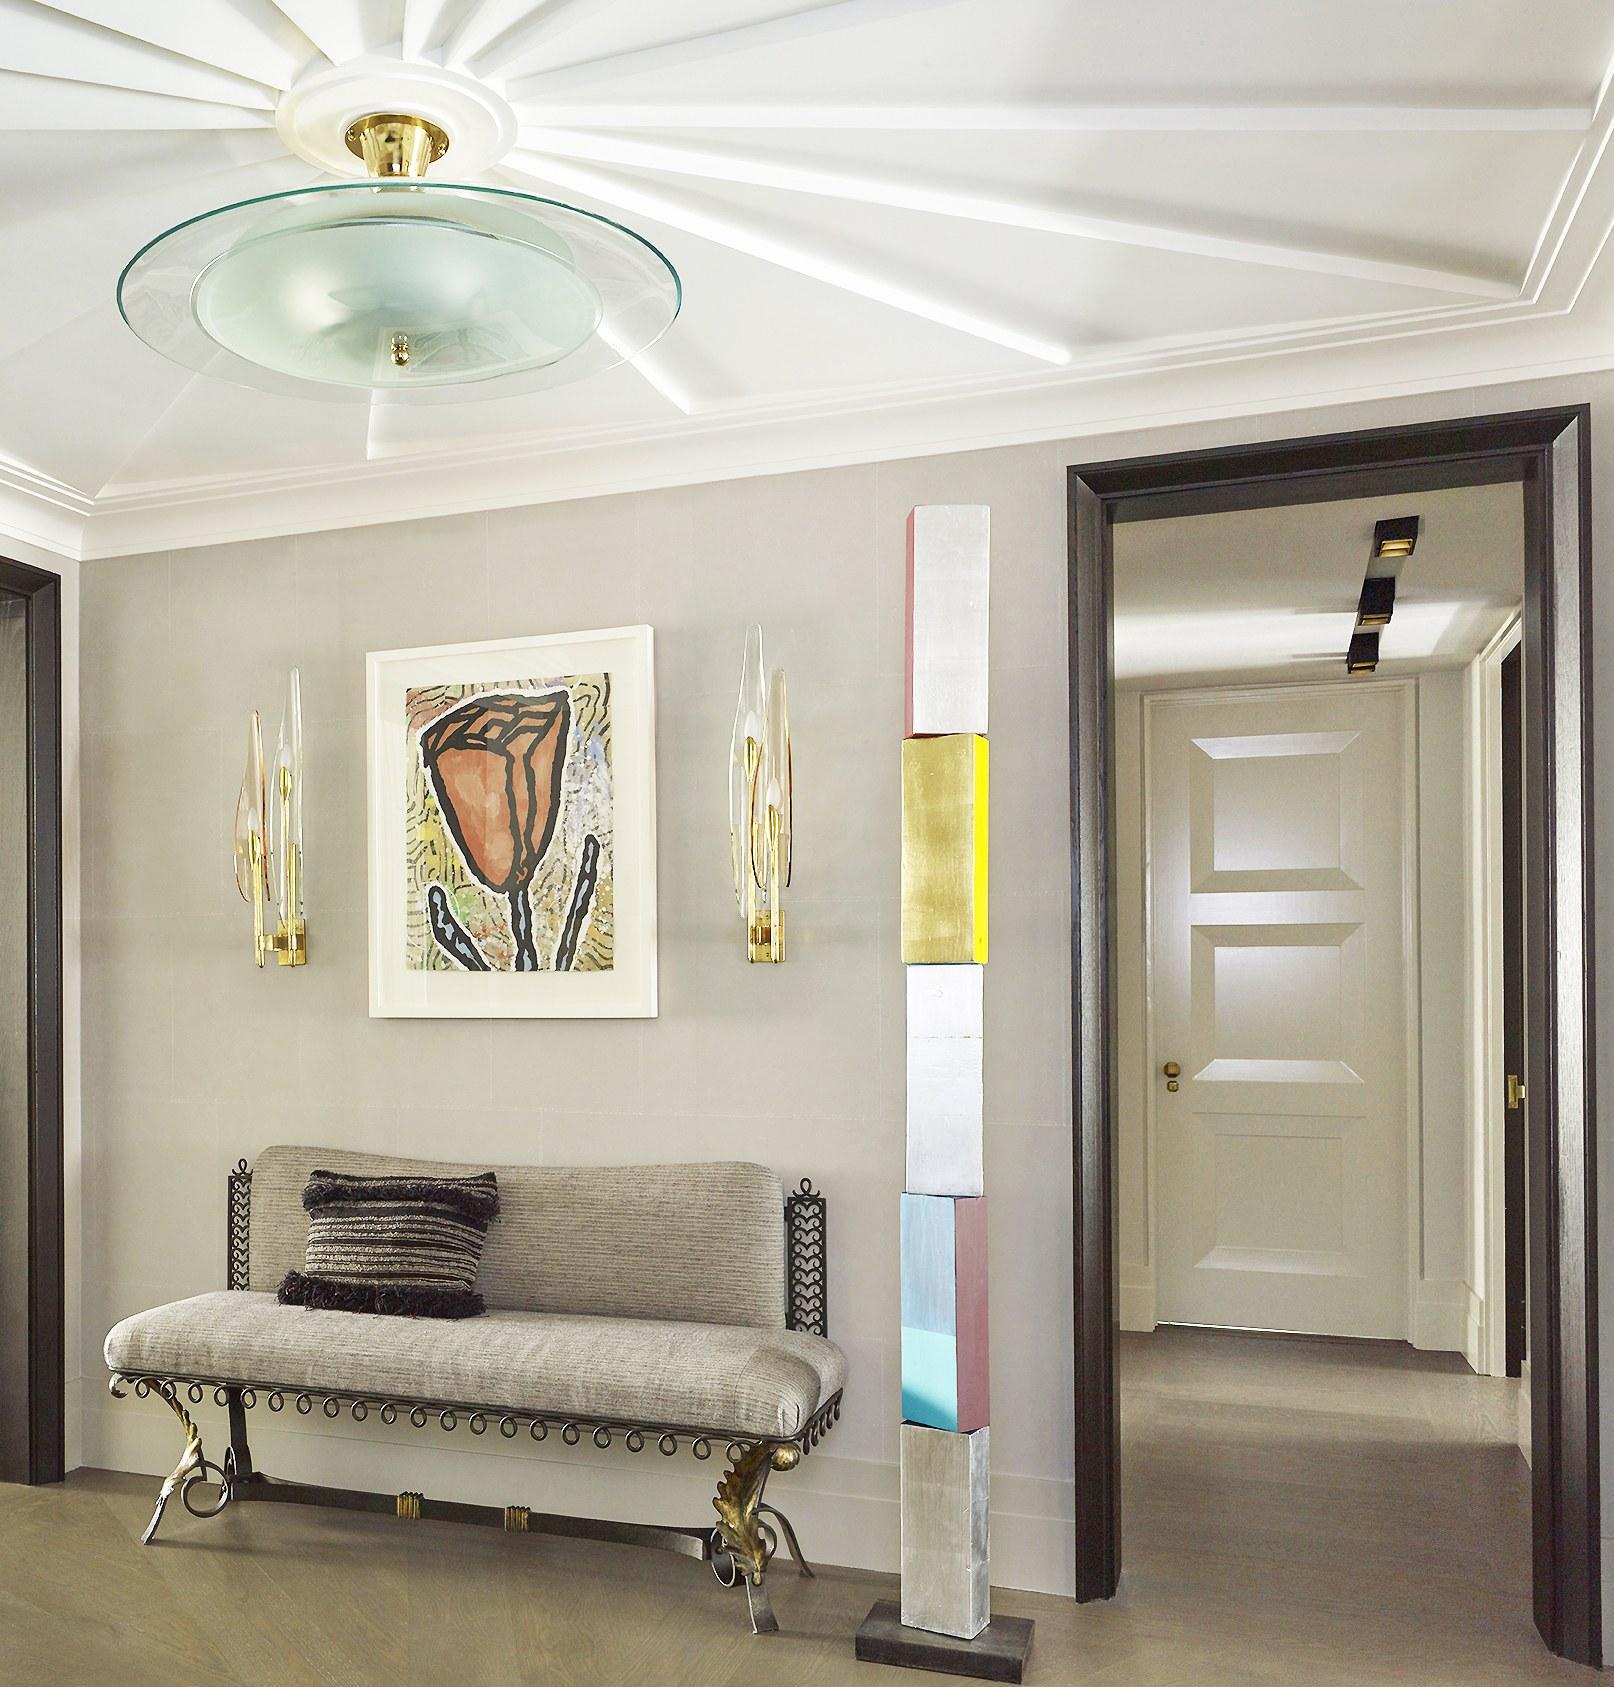 wesley-moon-NYC-apartment_02.jpg